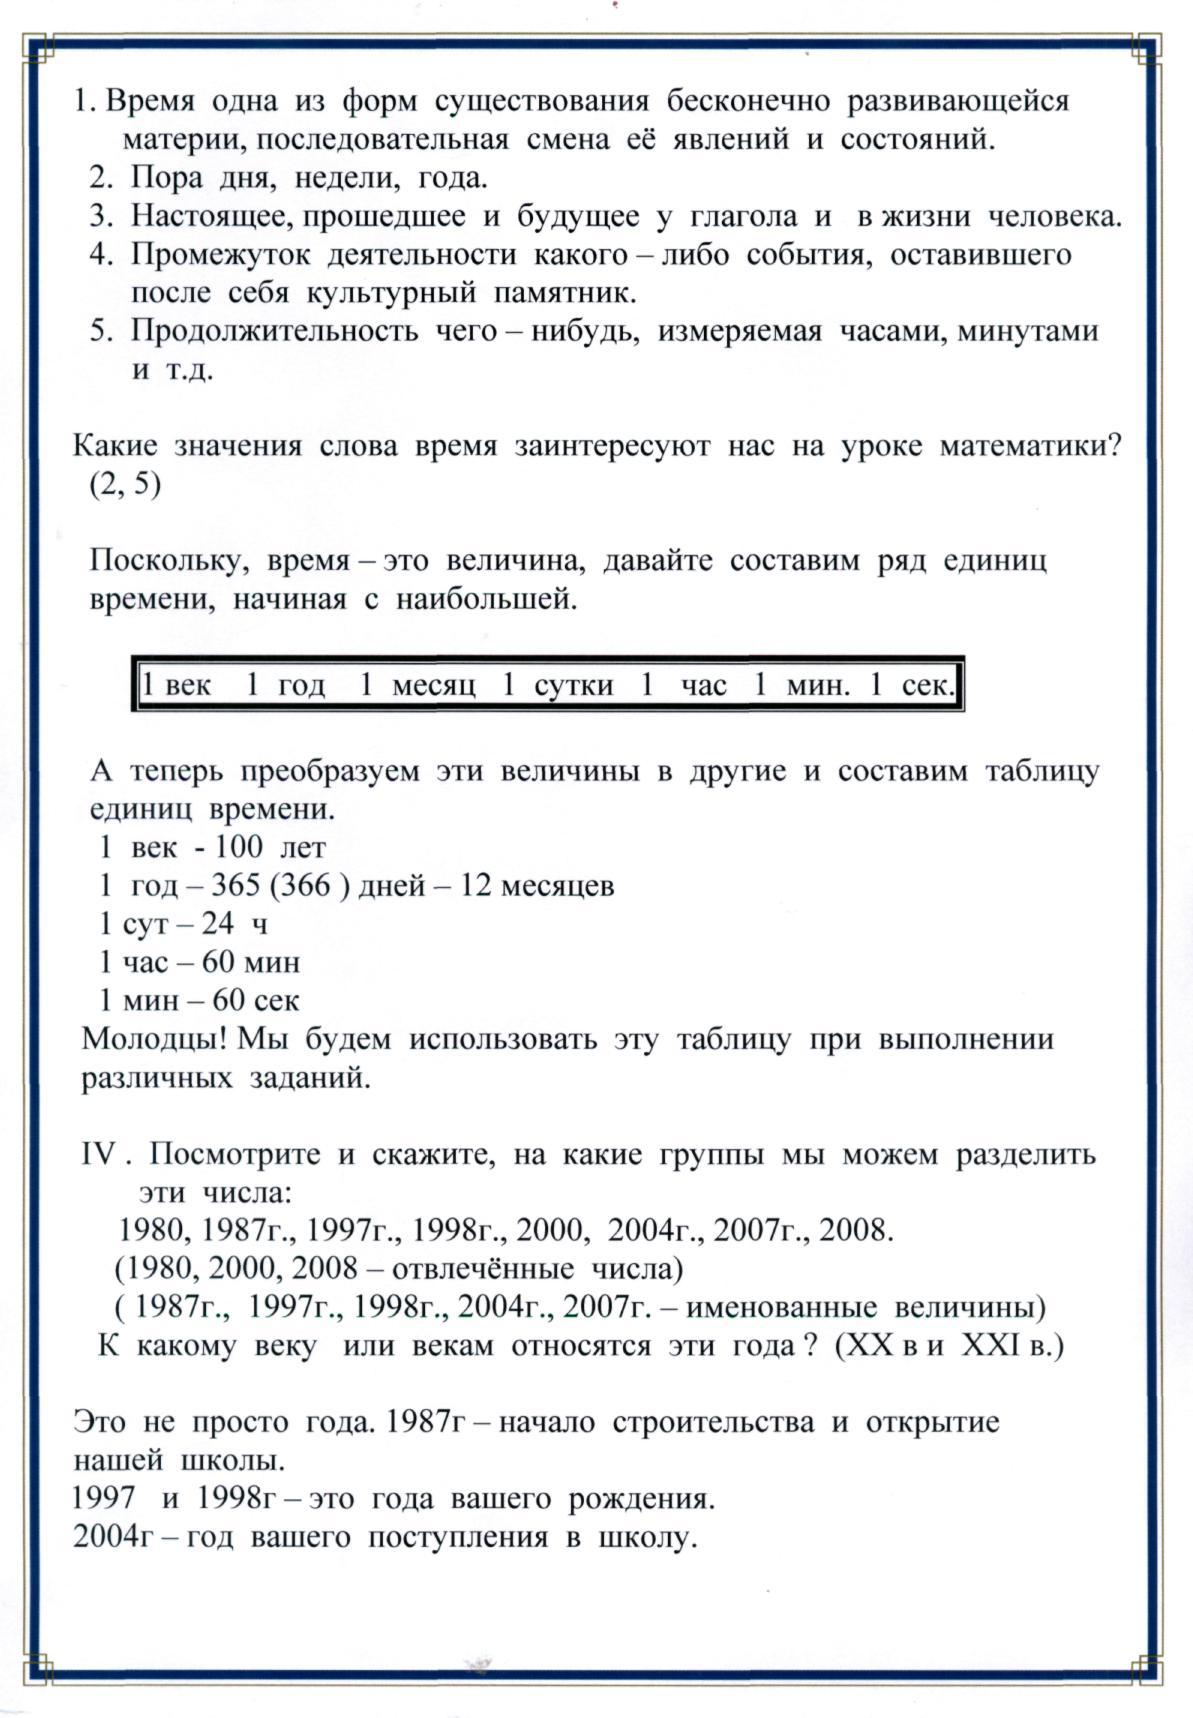 hello_html_mfc2e55d.jpg